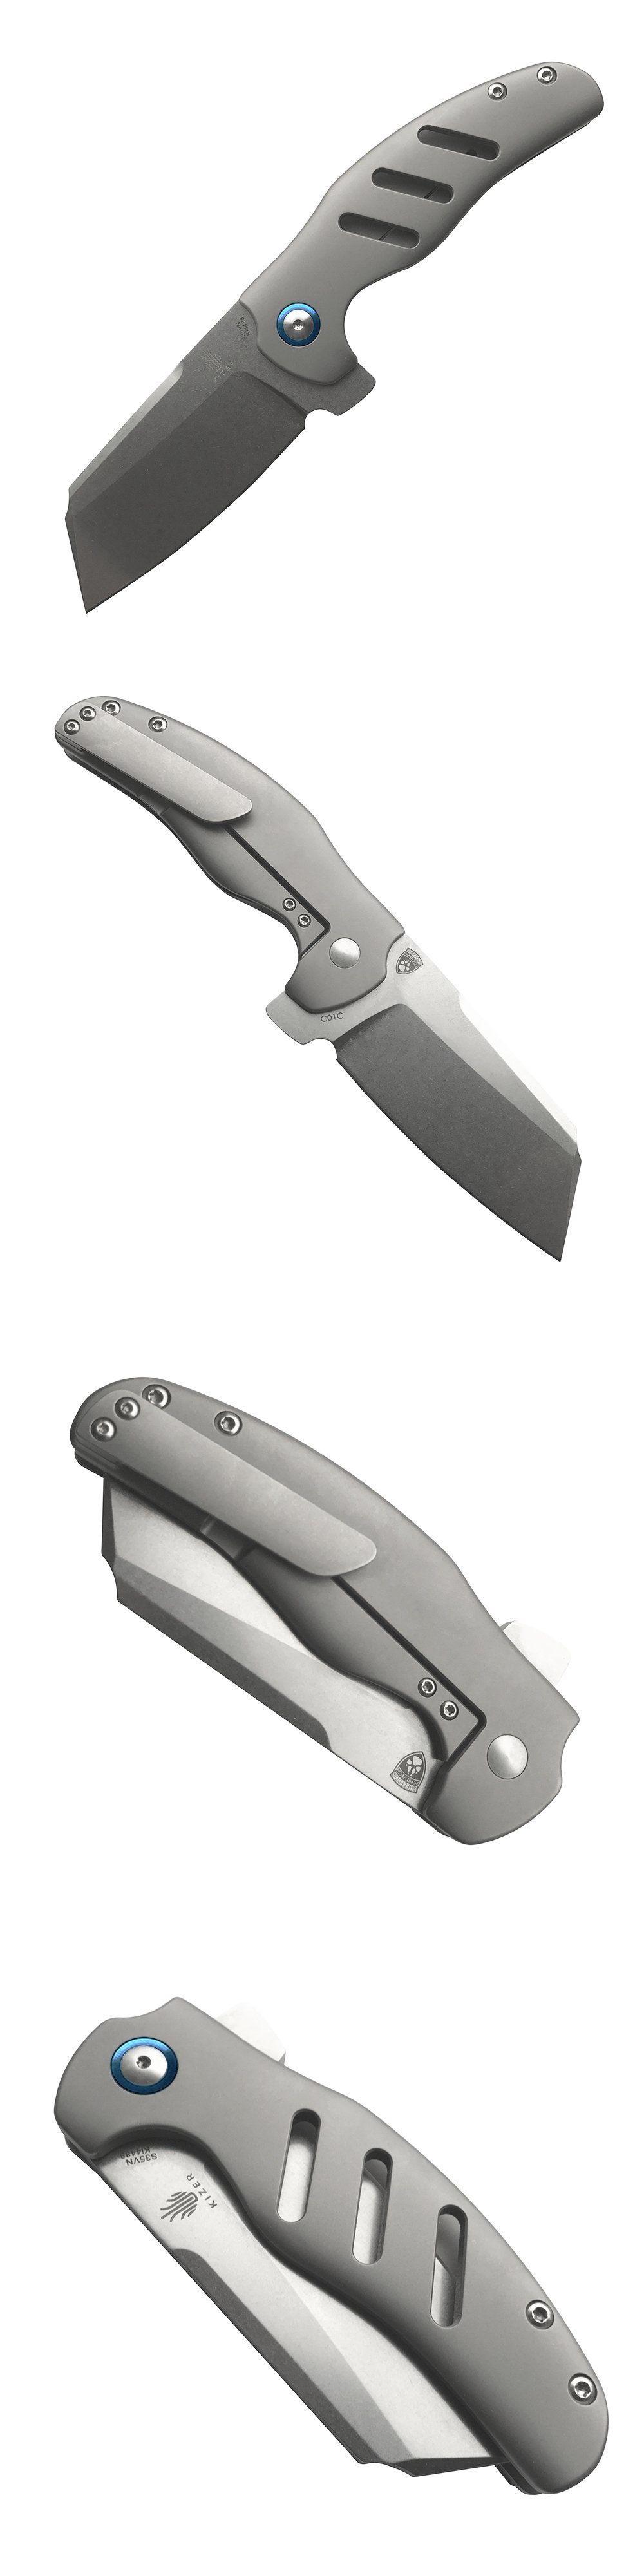 Knife sets kizer ki sheepdog knives cc flipper frame